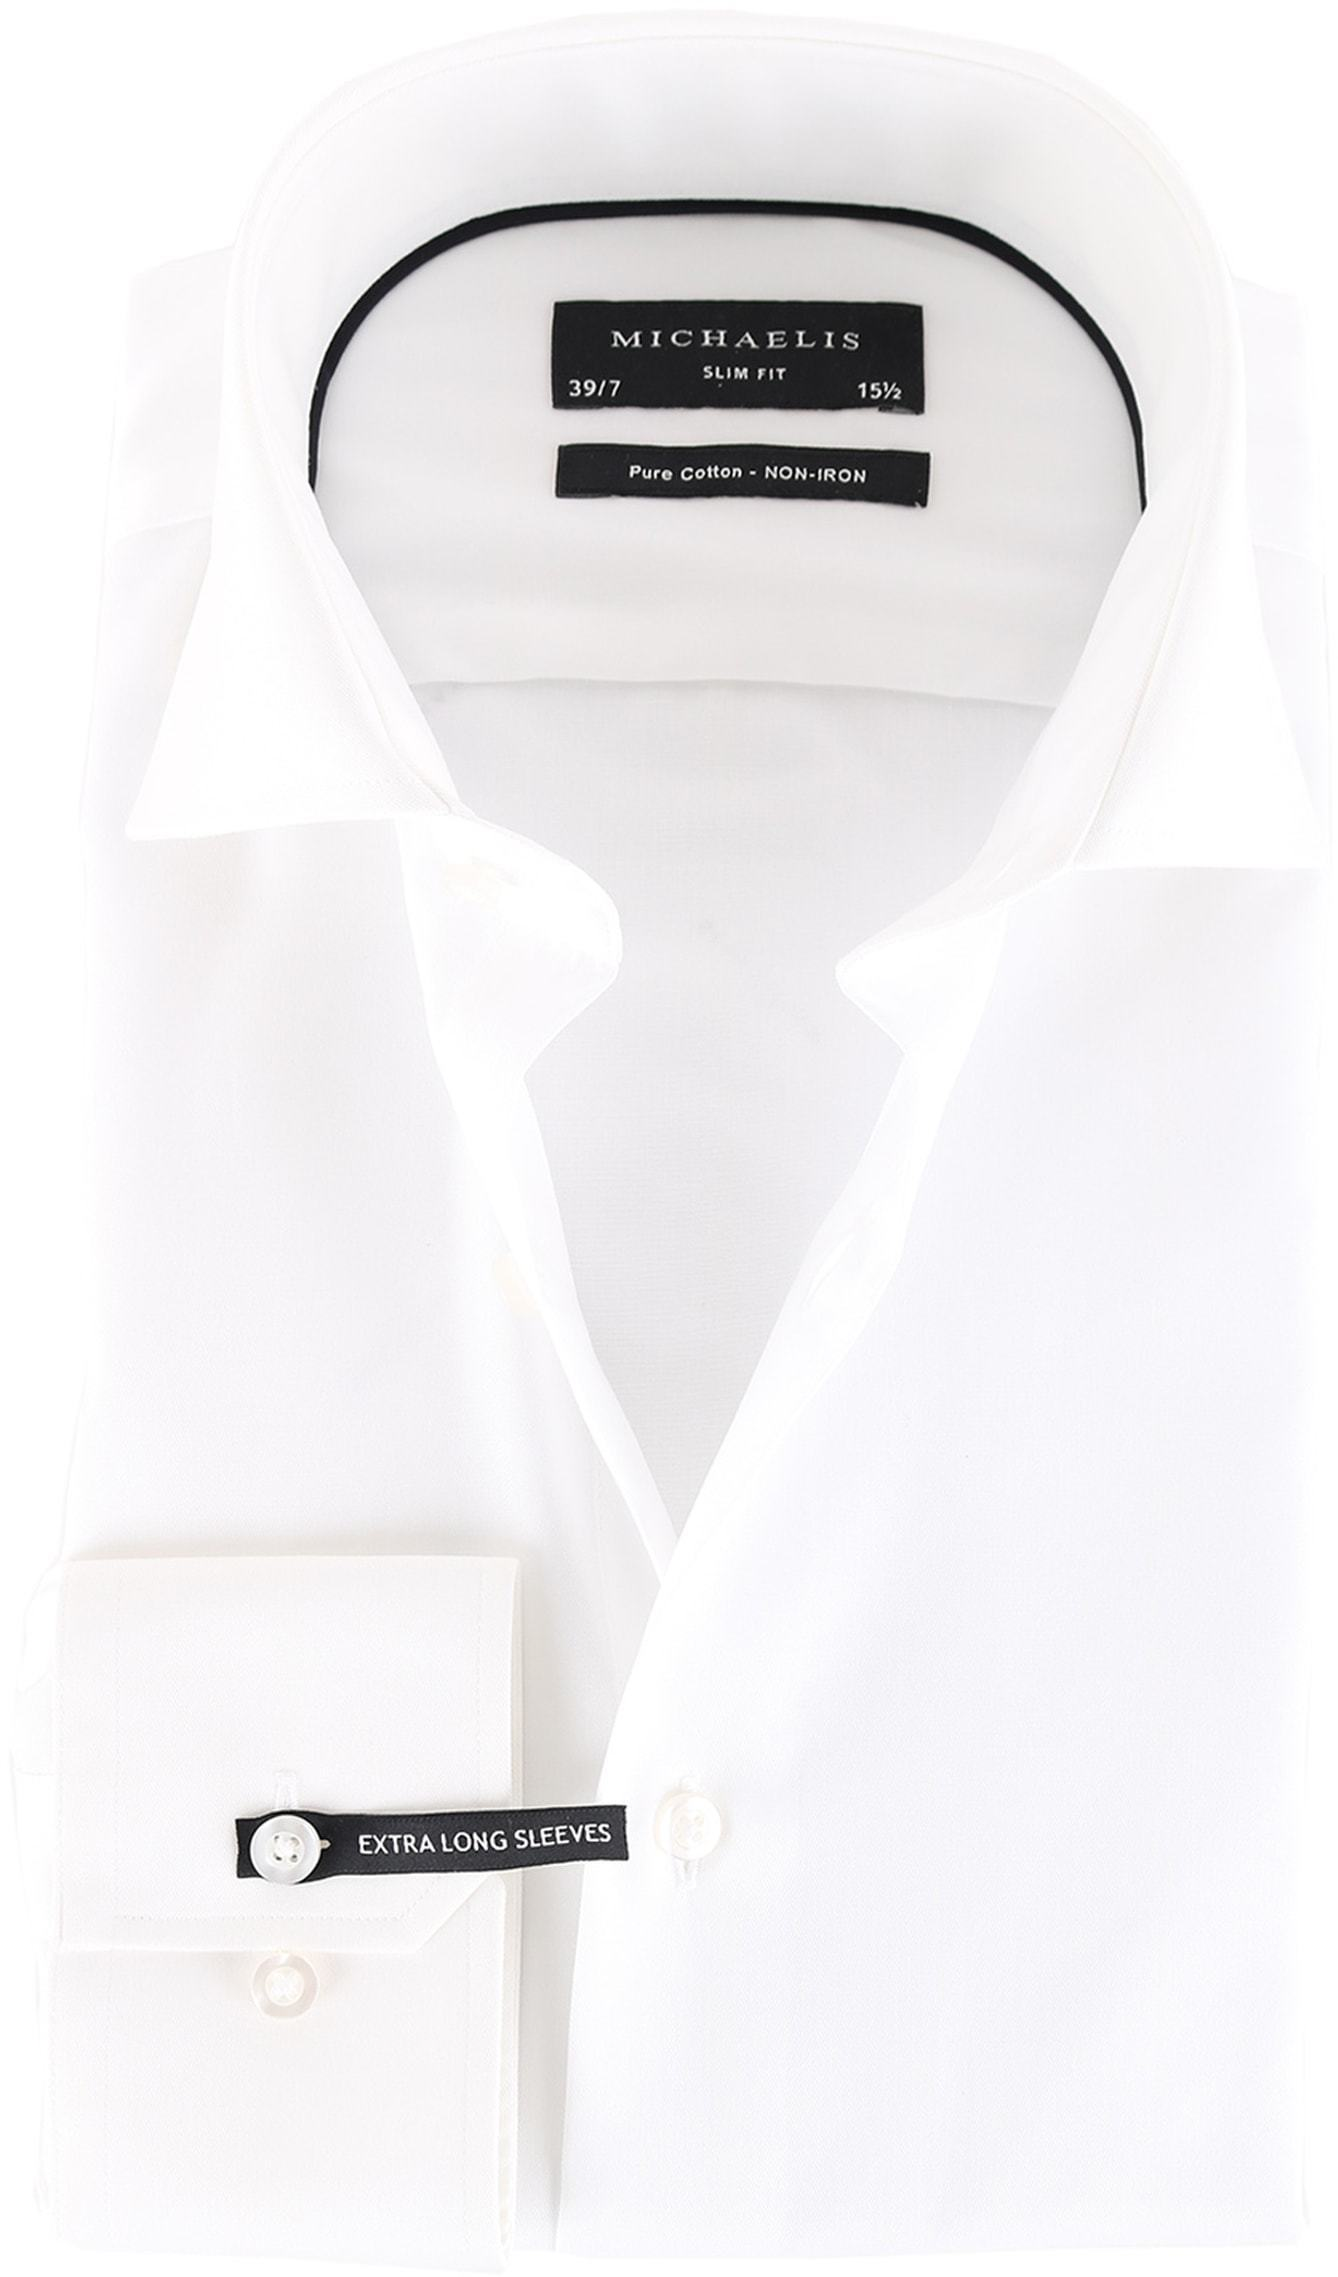 Michaelis Overhemd Wit SL7 foto 0